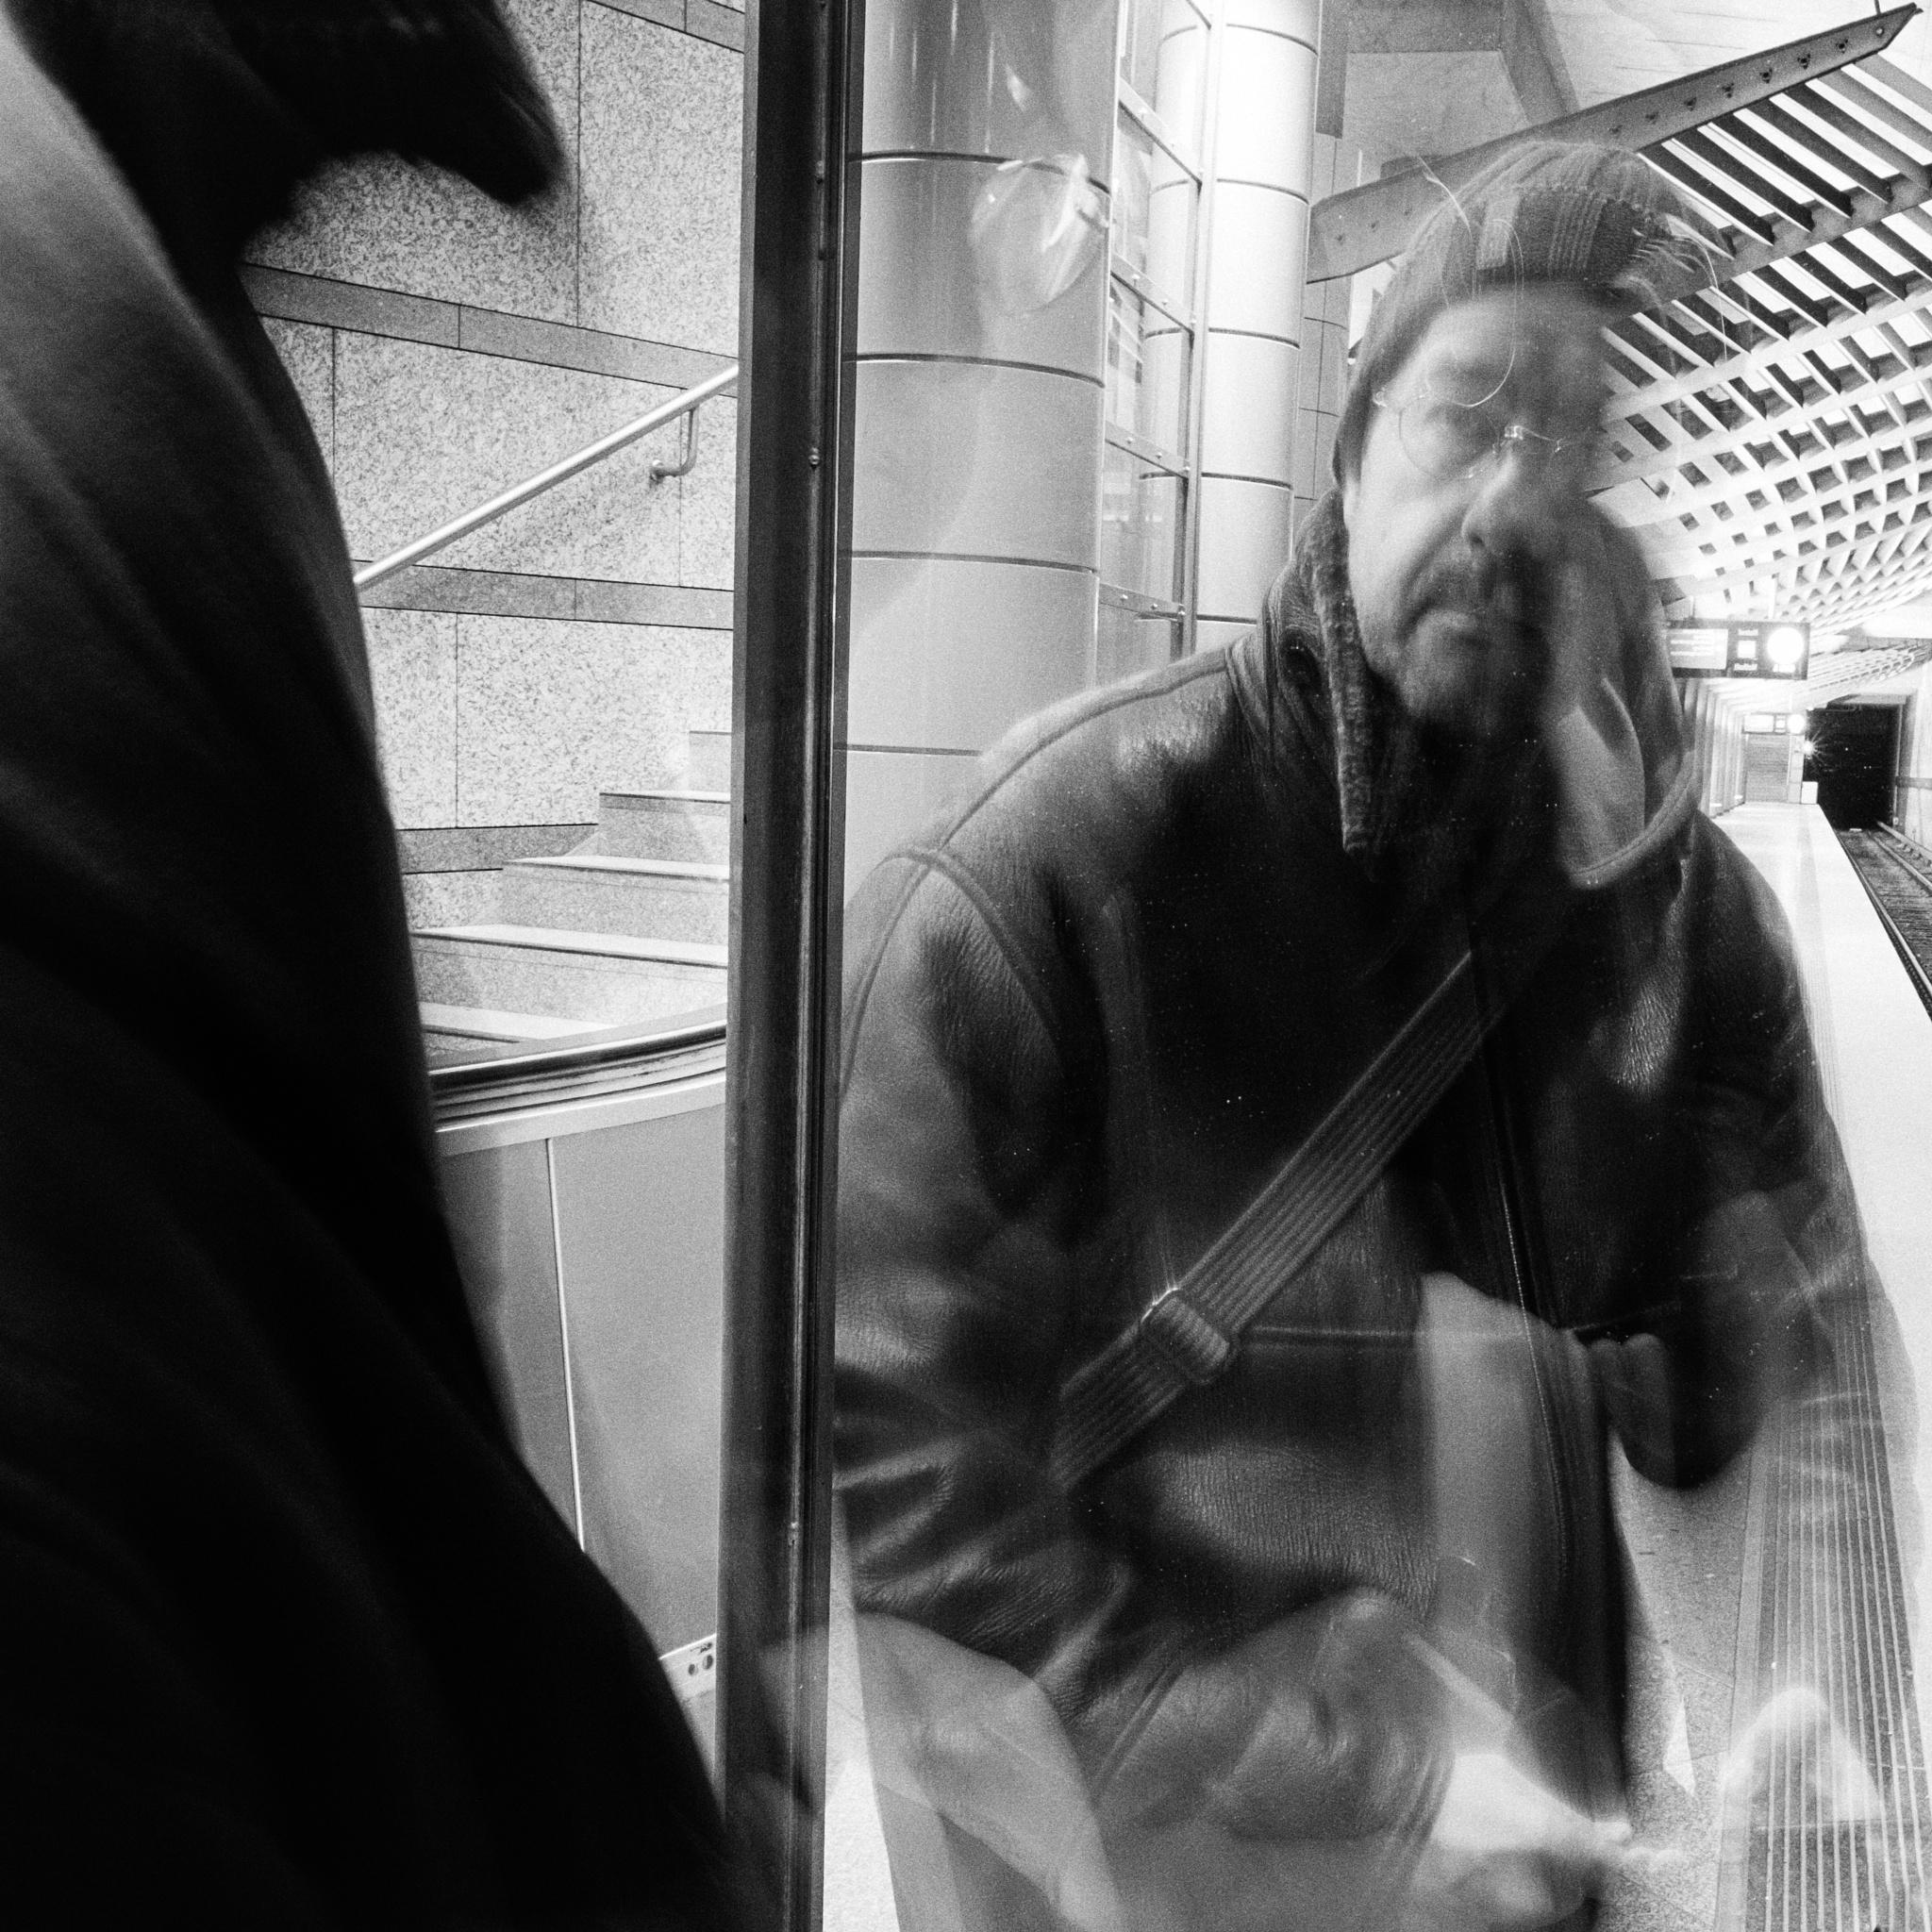 man in the mirror by Ulrich Gerndt